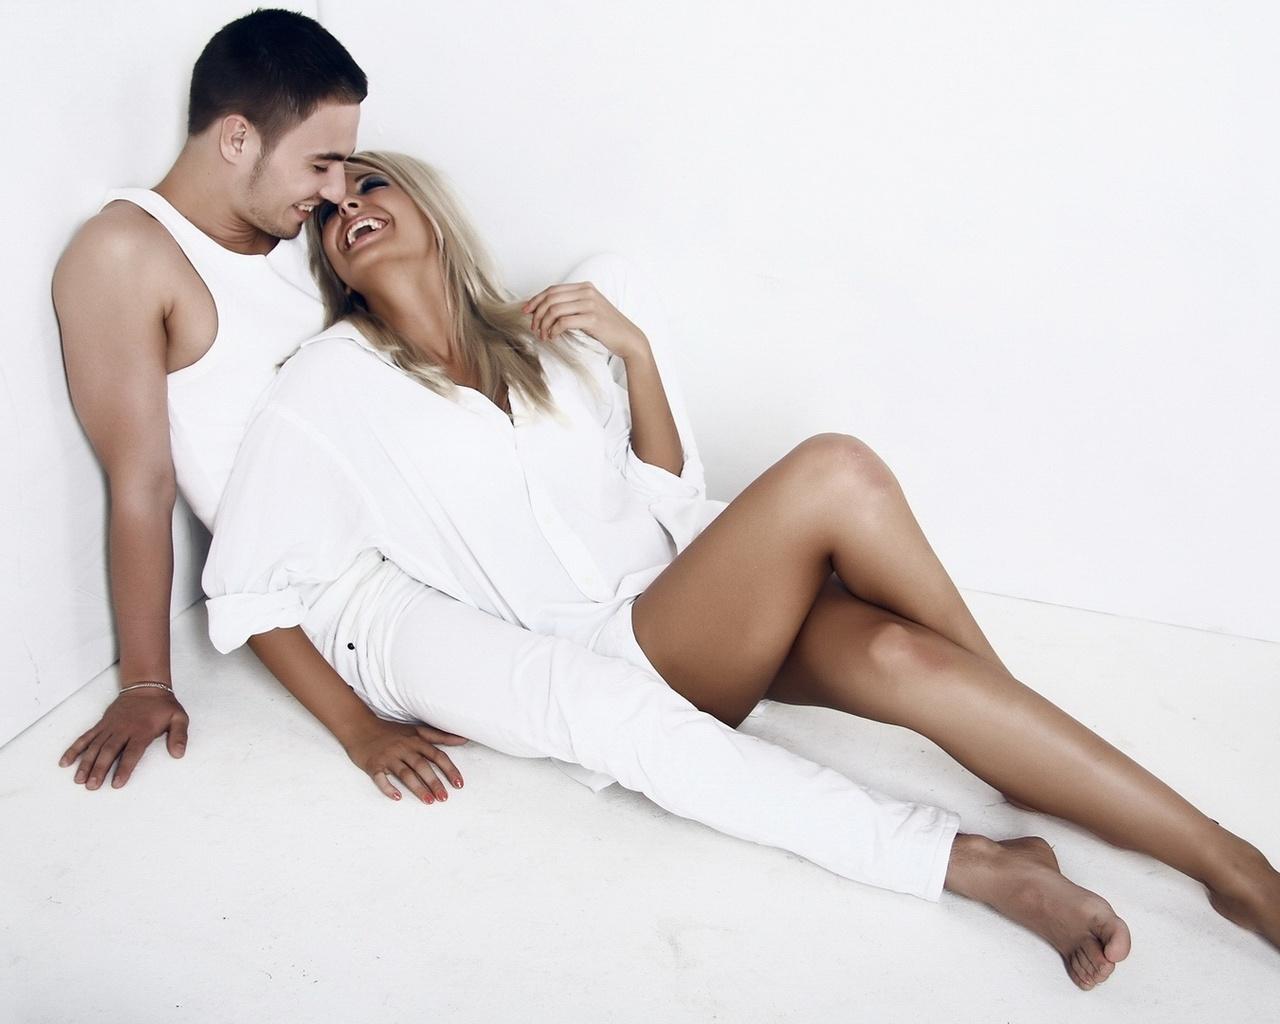 Не преувеличили ли роль секса